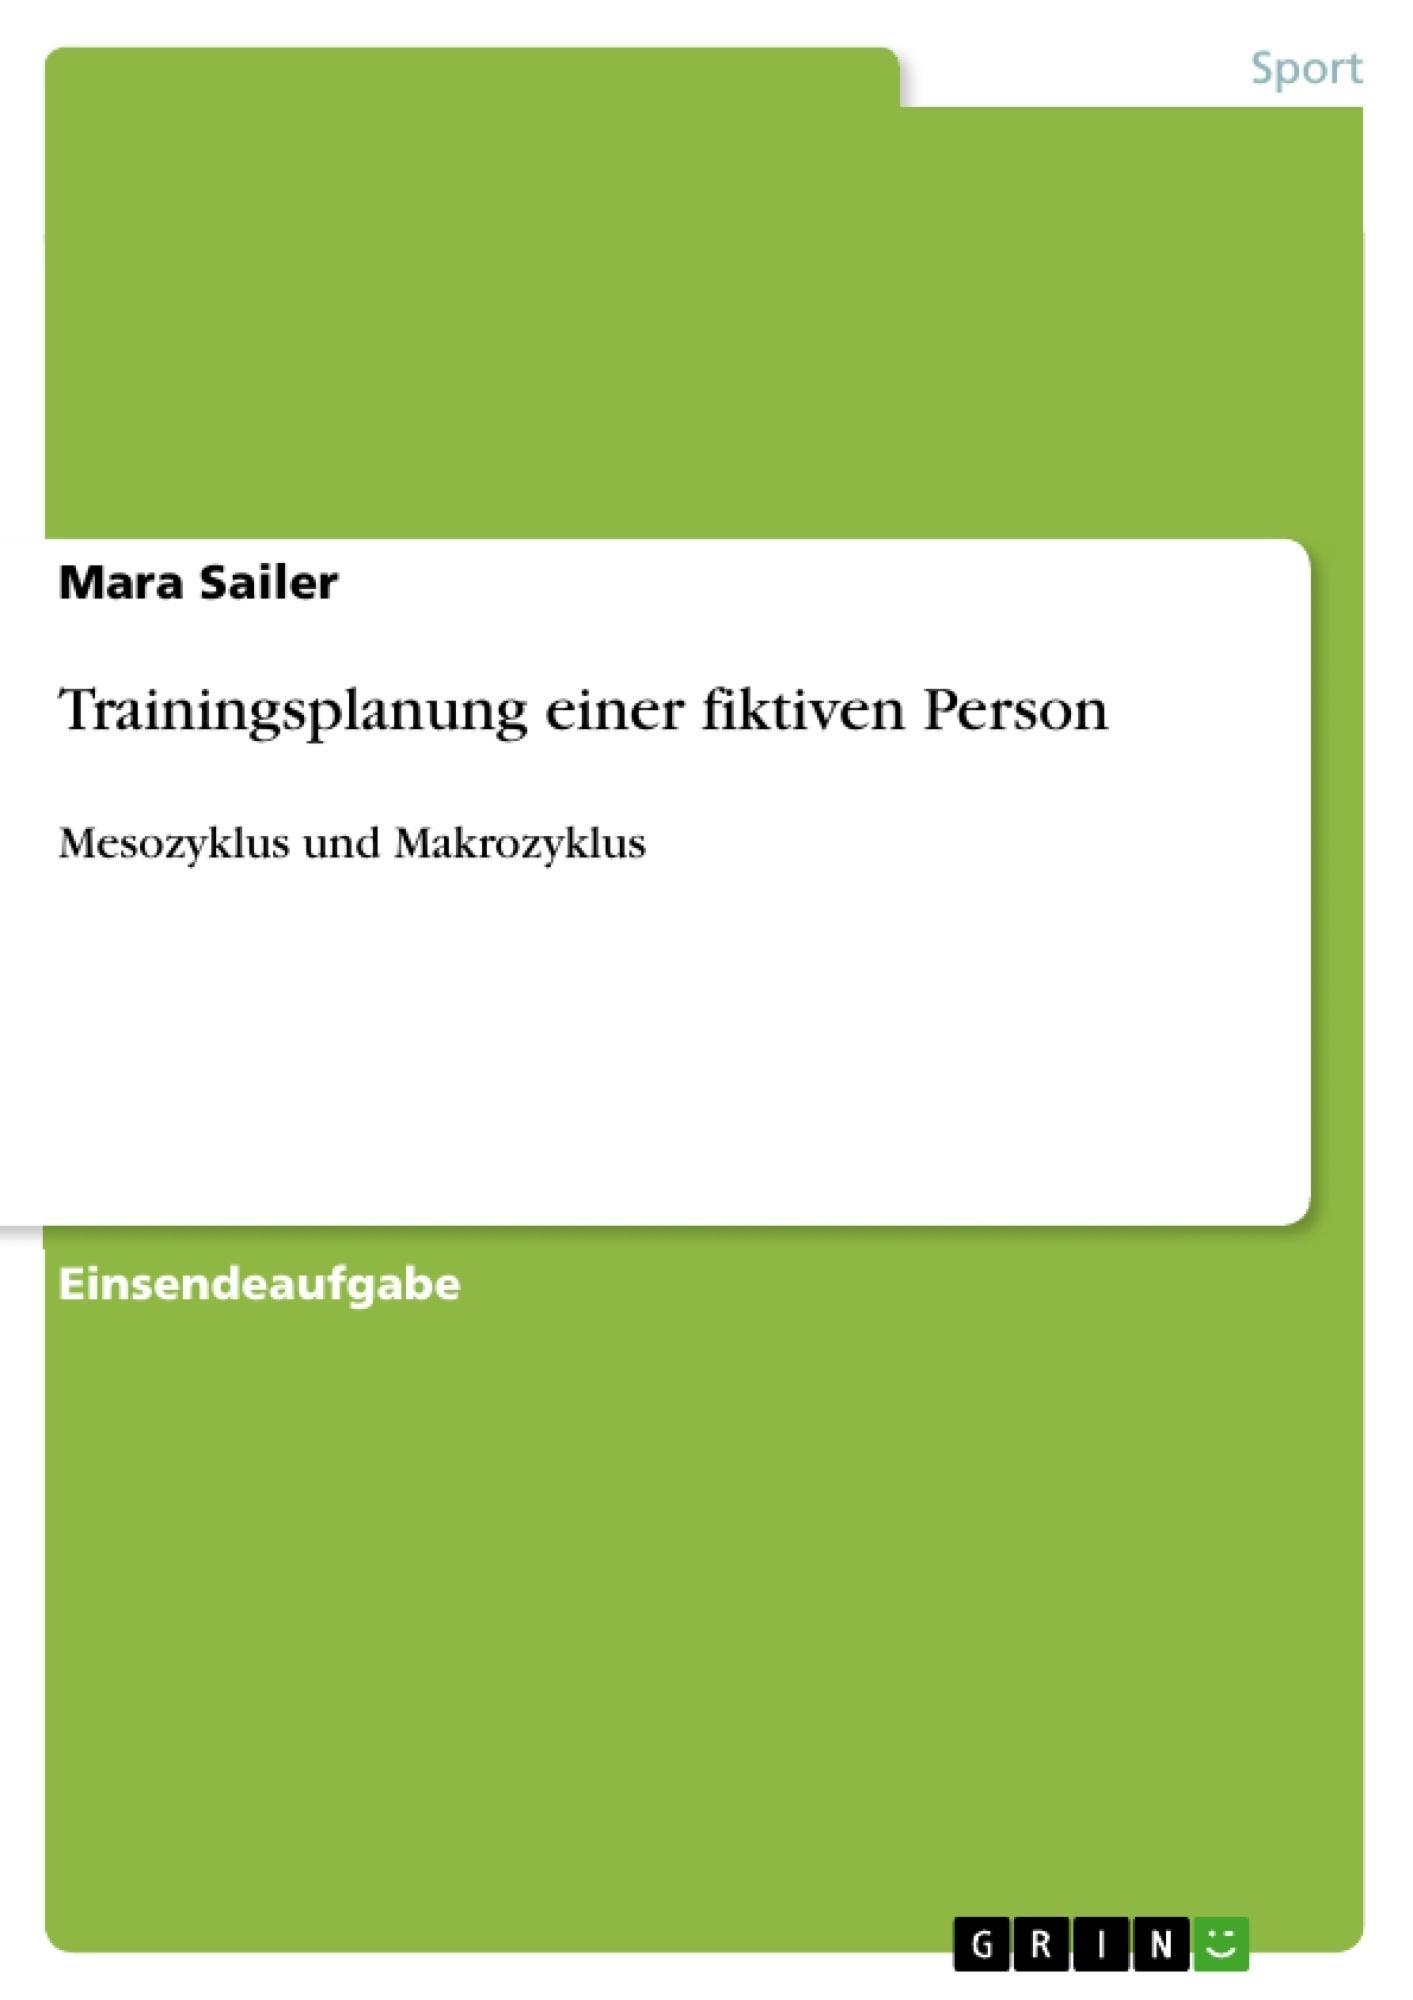 Titel: Trainingsplanung einer fiktiven Person